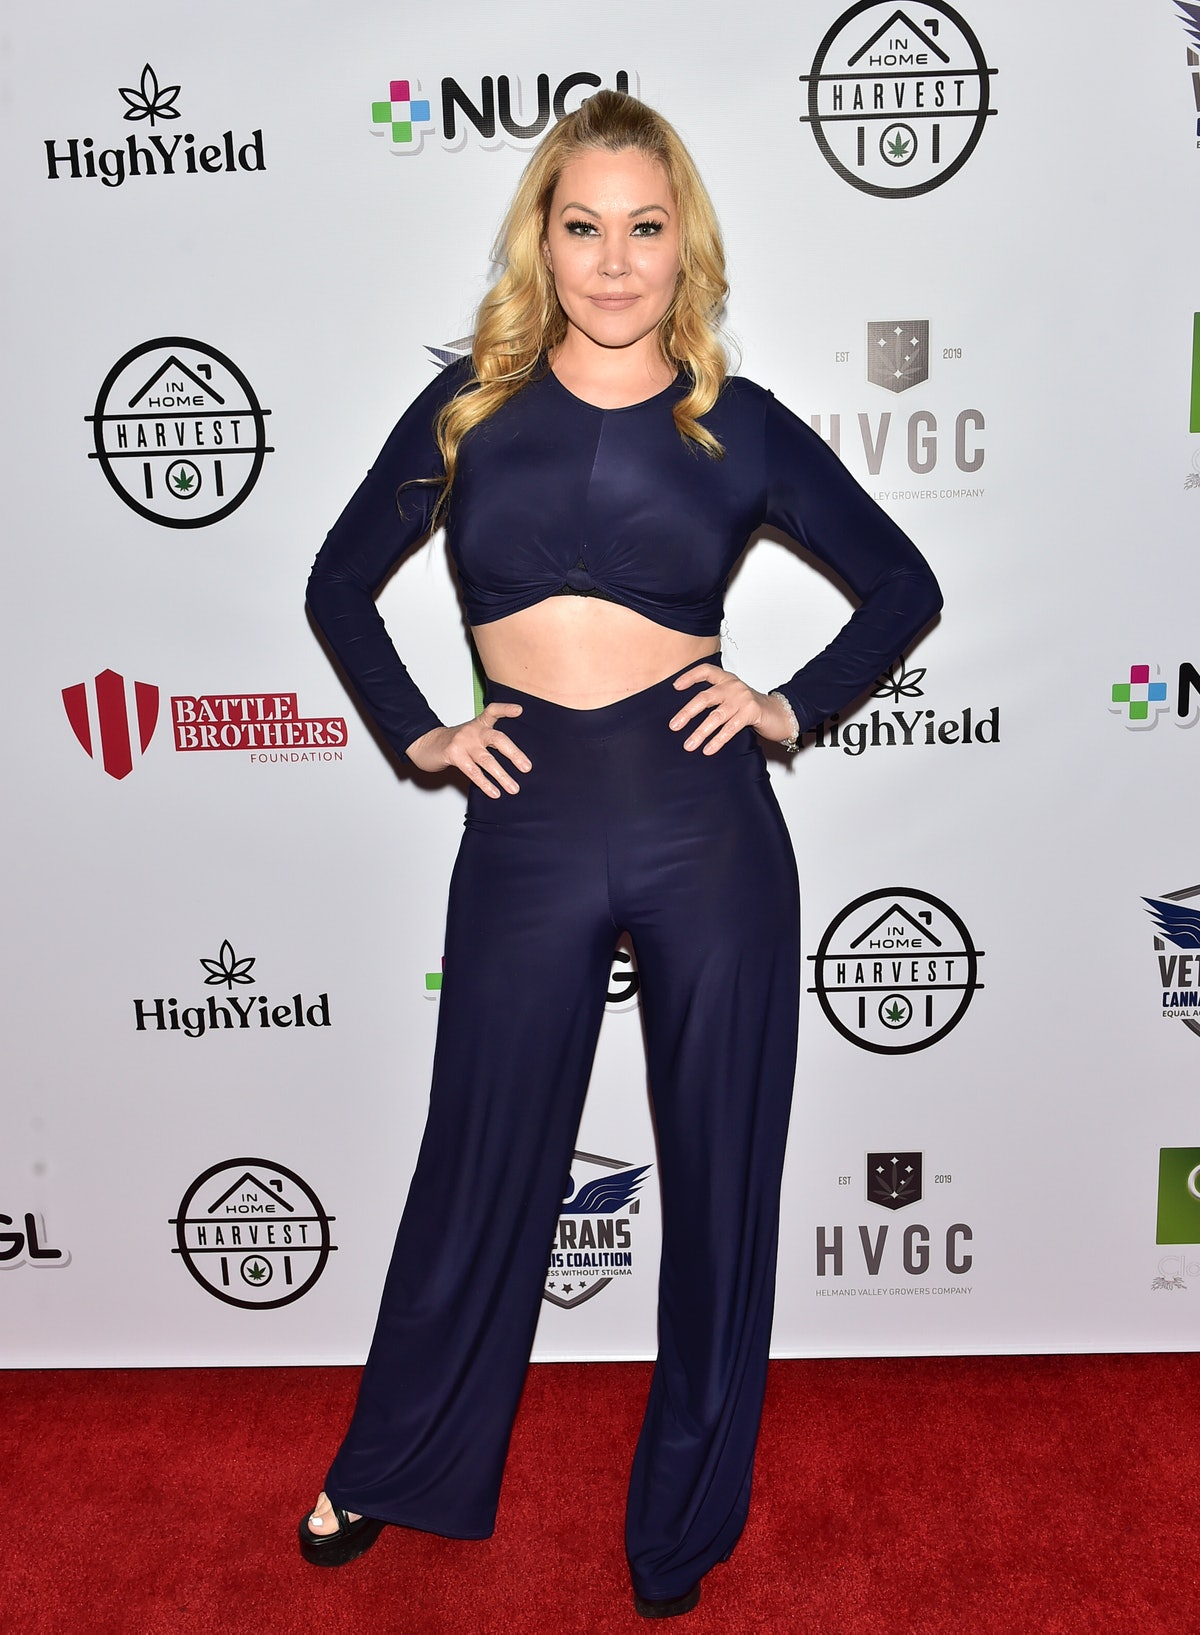 LOS ANGELES, CALIFORNIA - DECEMBER 19: Shanna Moakler arrives at 2019 Heroes' Harvest on December 19...